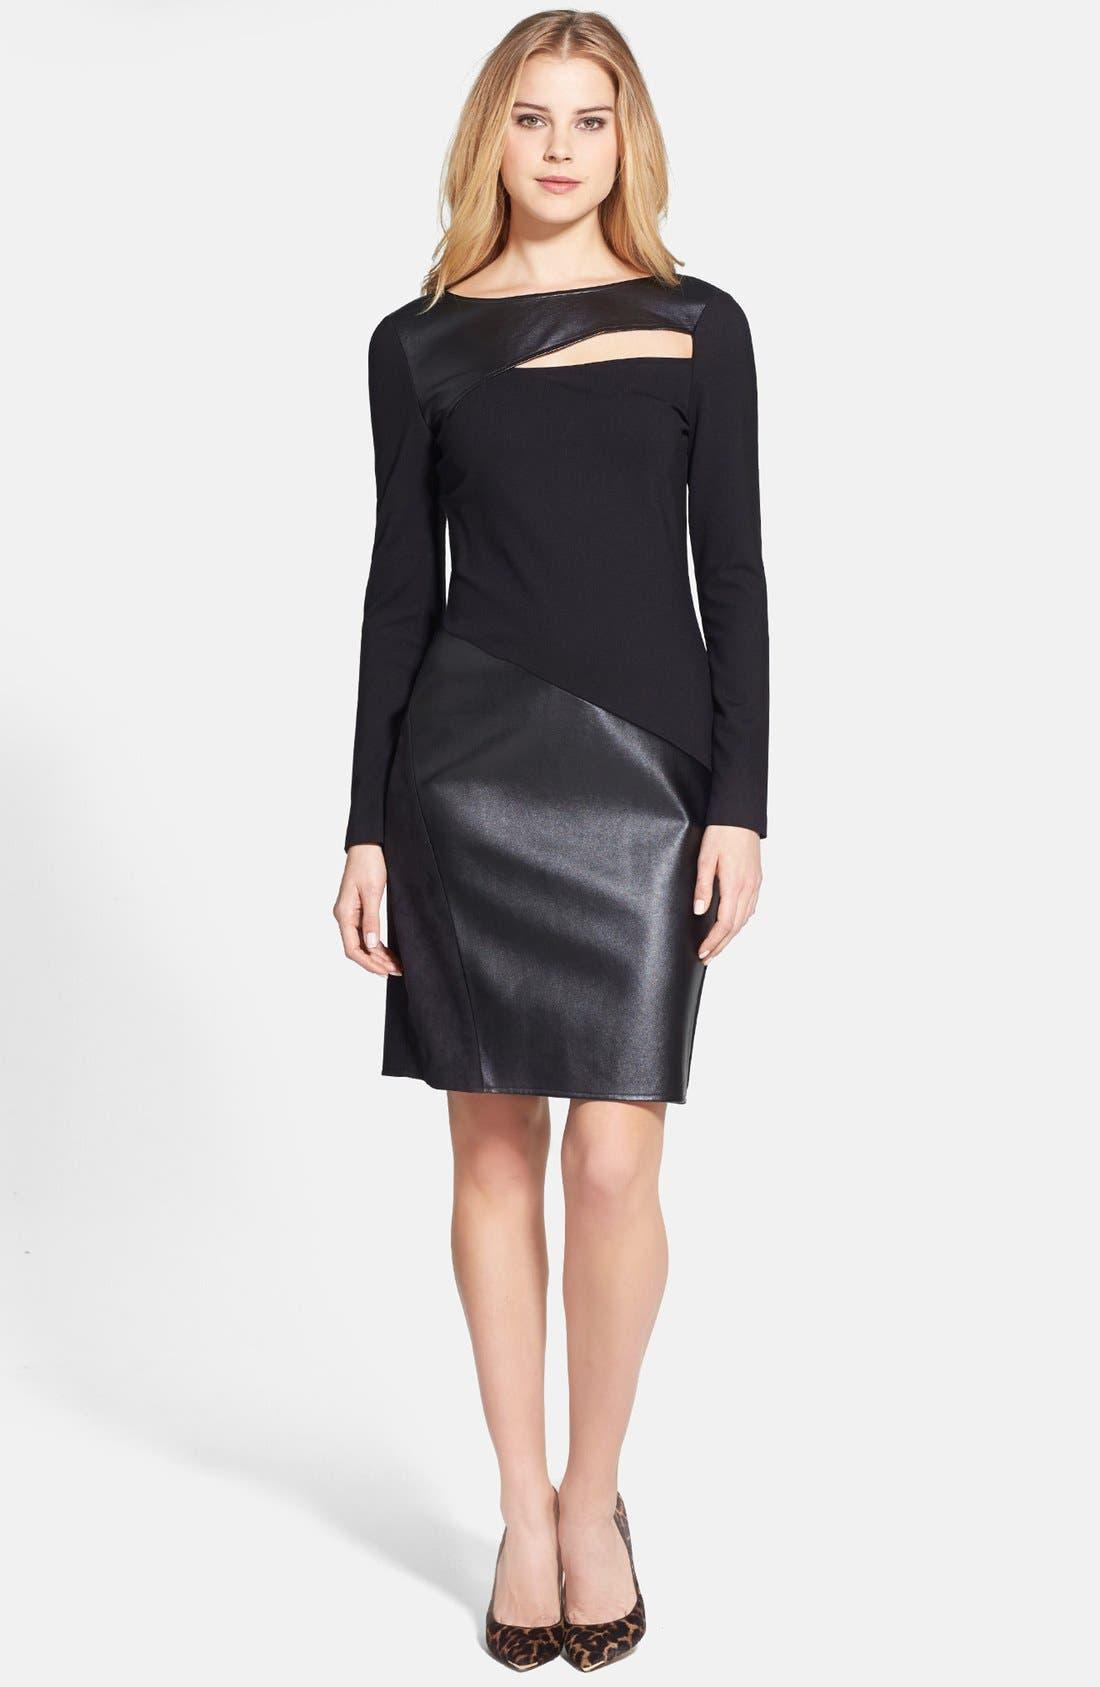 Alternate Image 1 Selected - DKNYC Ponte & Faux Leather Sheath Dress